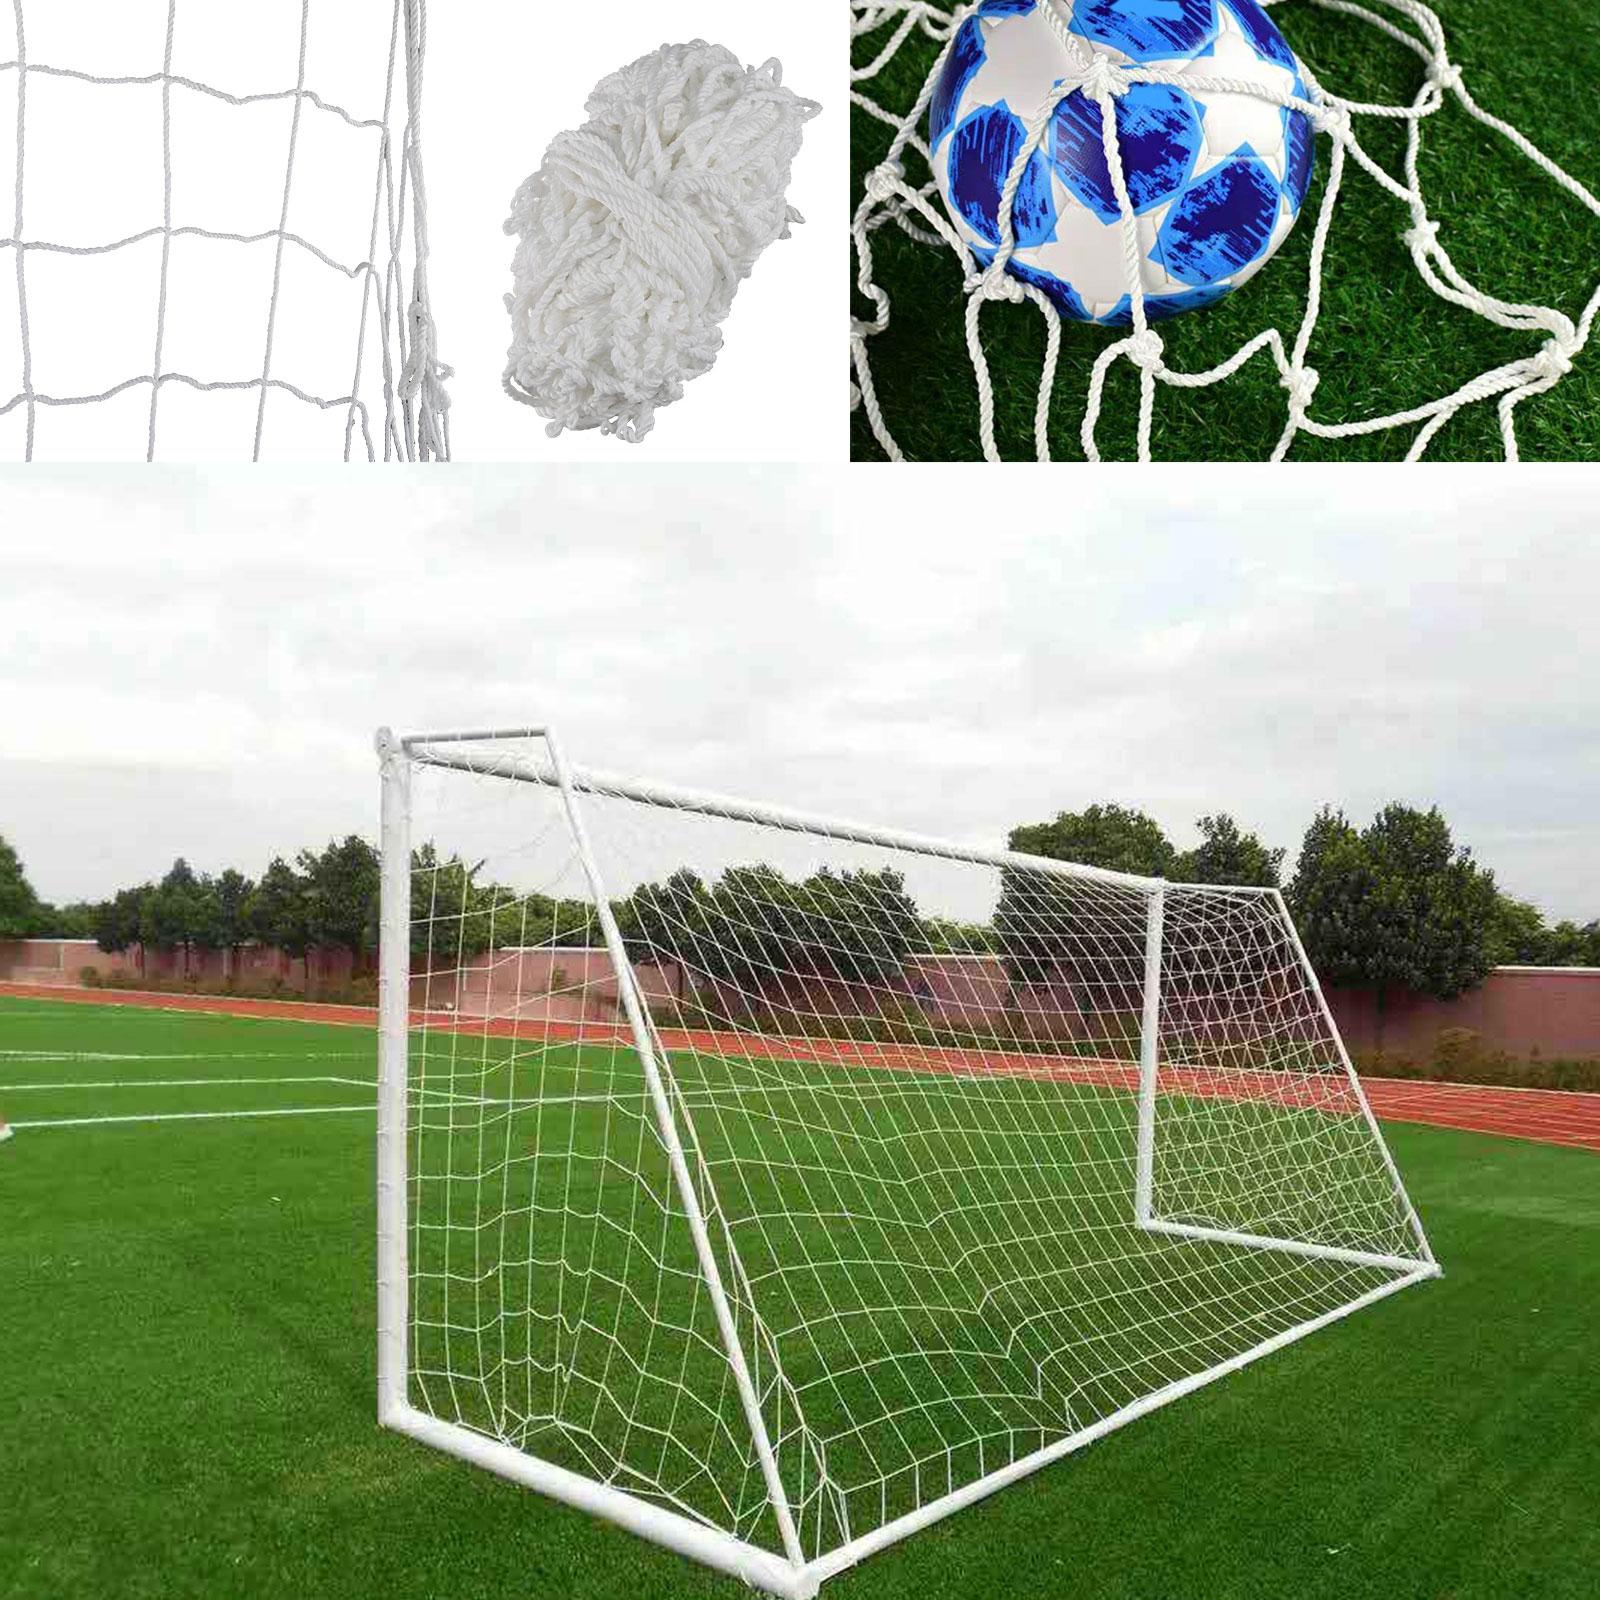 6-4ft-PE-Football-Soccer-Goal-Net-Outdoor-Backyard-Sport-Match-Training-for-Kids thumbnail 7